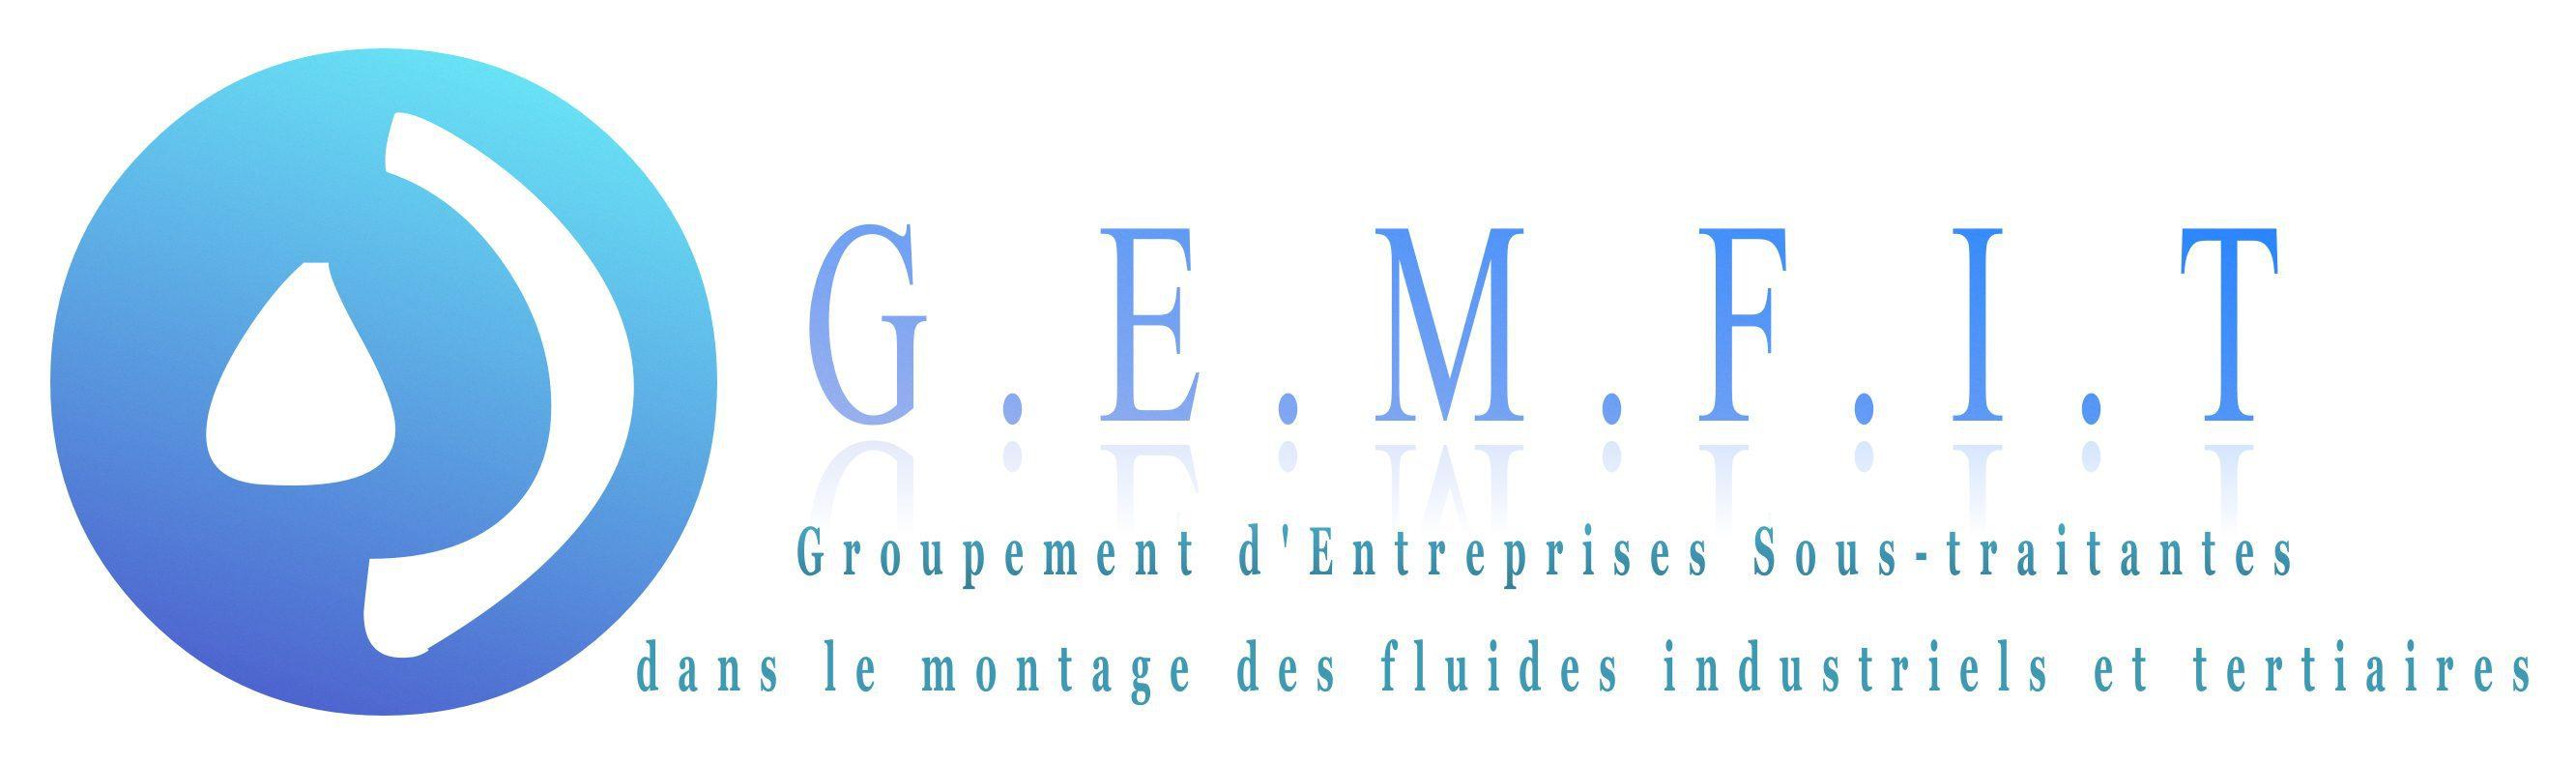 cropped-cropped-logo-gemfit-final-21.jpg